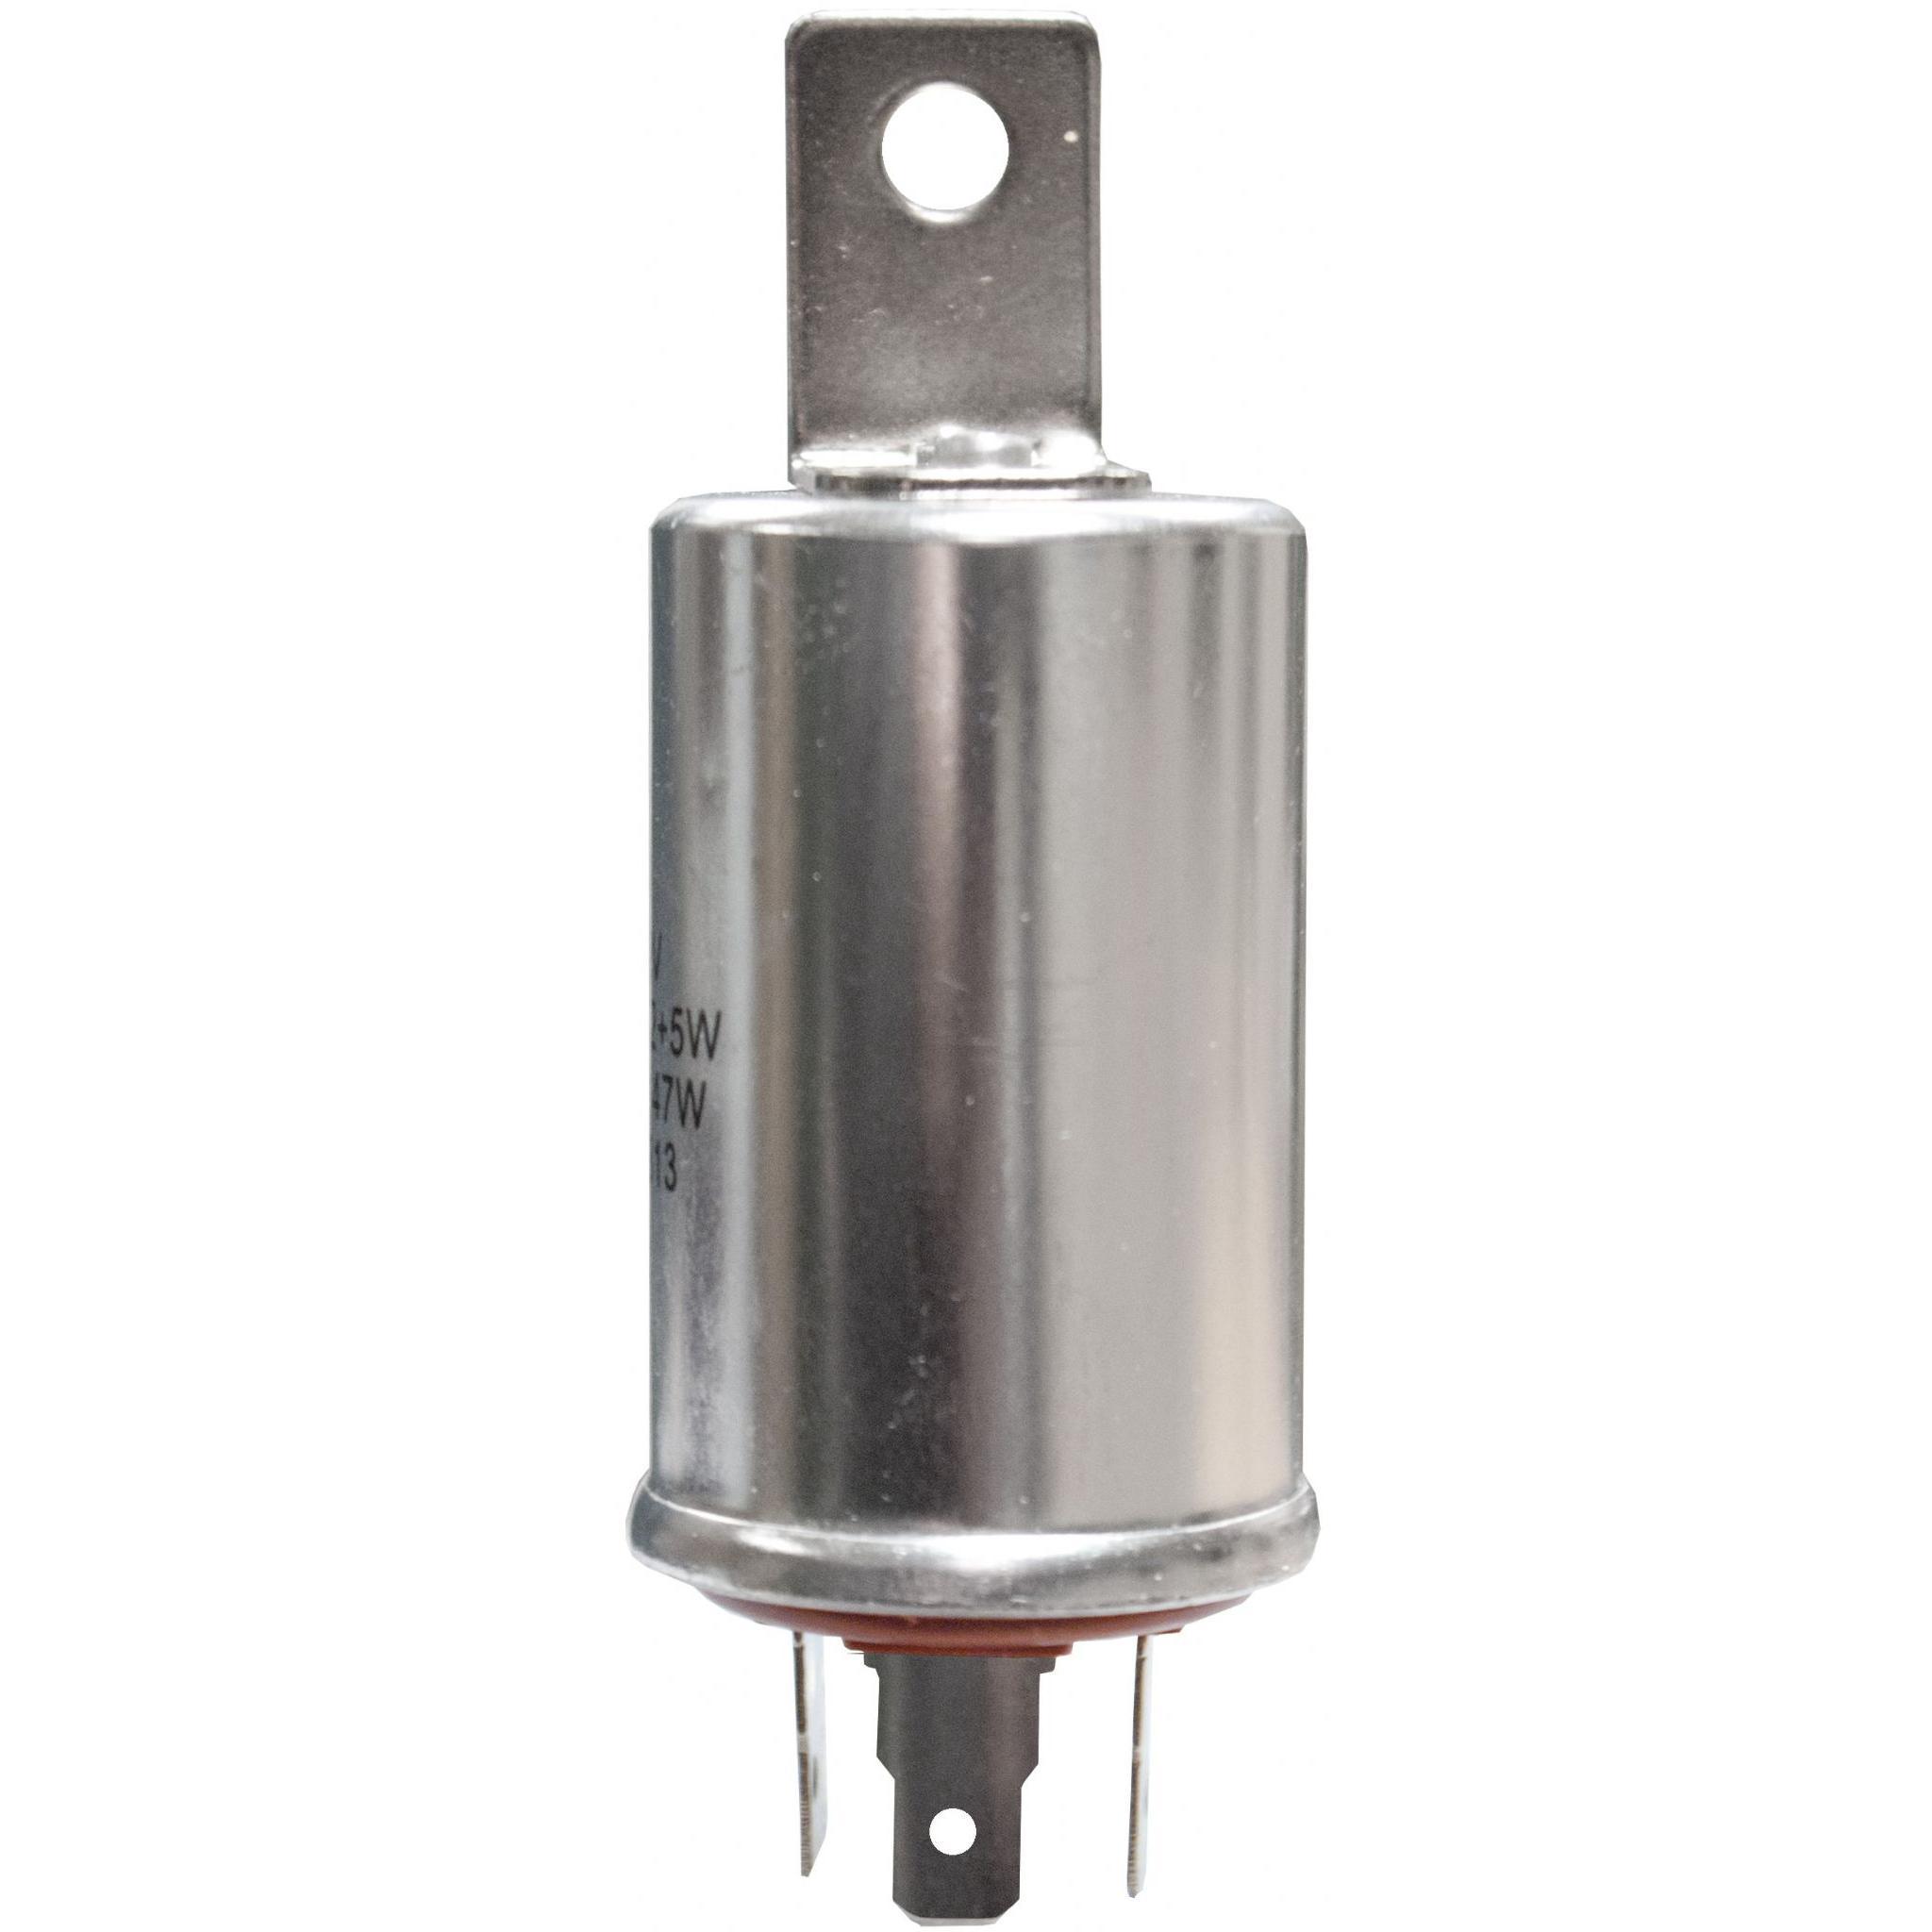 Intermotor 58800 Turn Signal Indicator Flasher Relay Switch Unit 12V Electrical